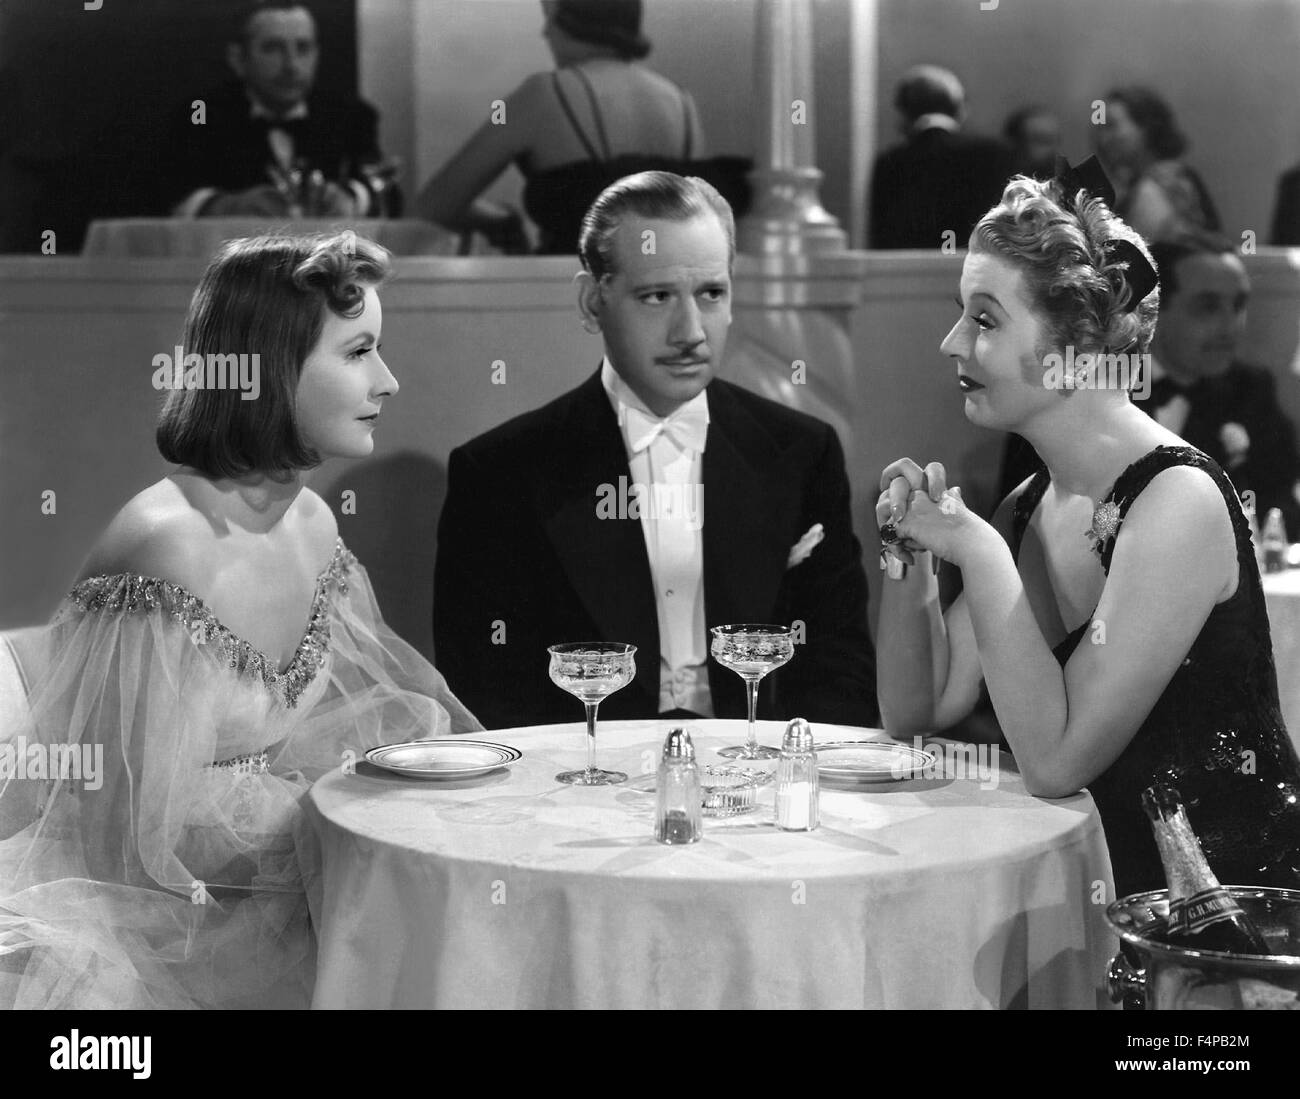 Greta Garbo, Melvyn Douglas, Ina Claire / Ninotchka 1939 directed by Ernst Lubitsch - Stock Image